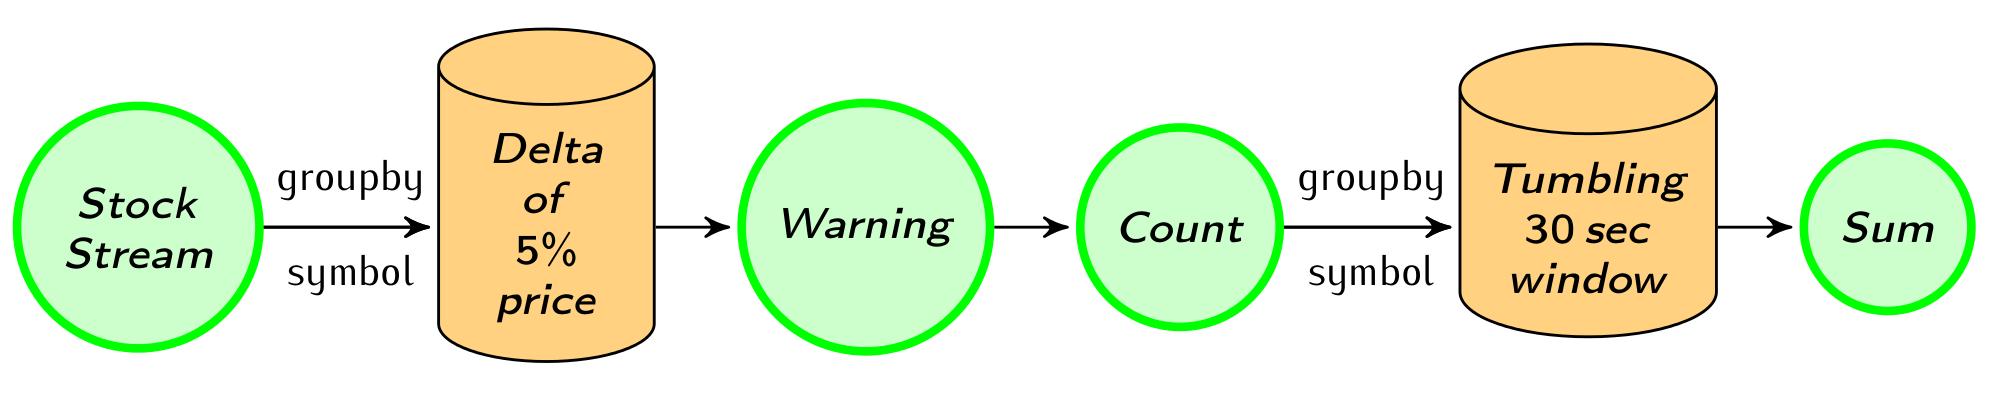 Data-driven windowing semantics